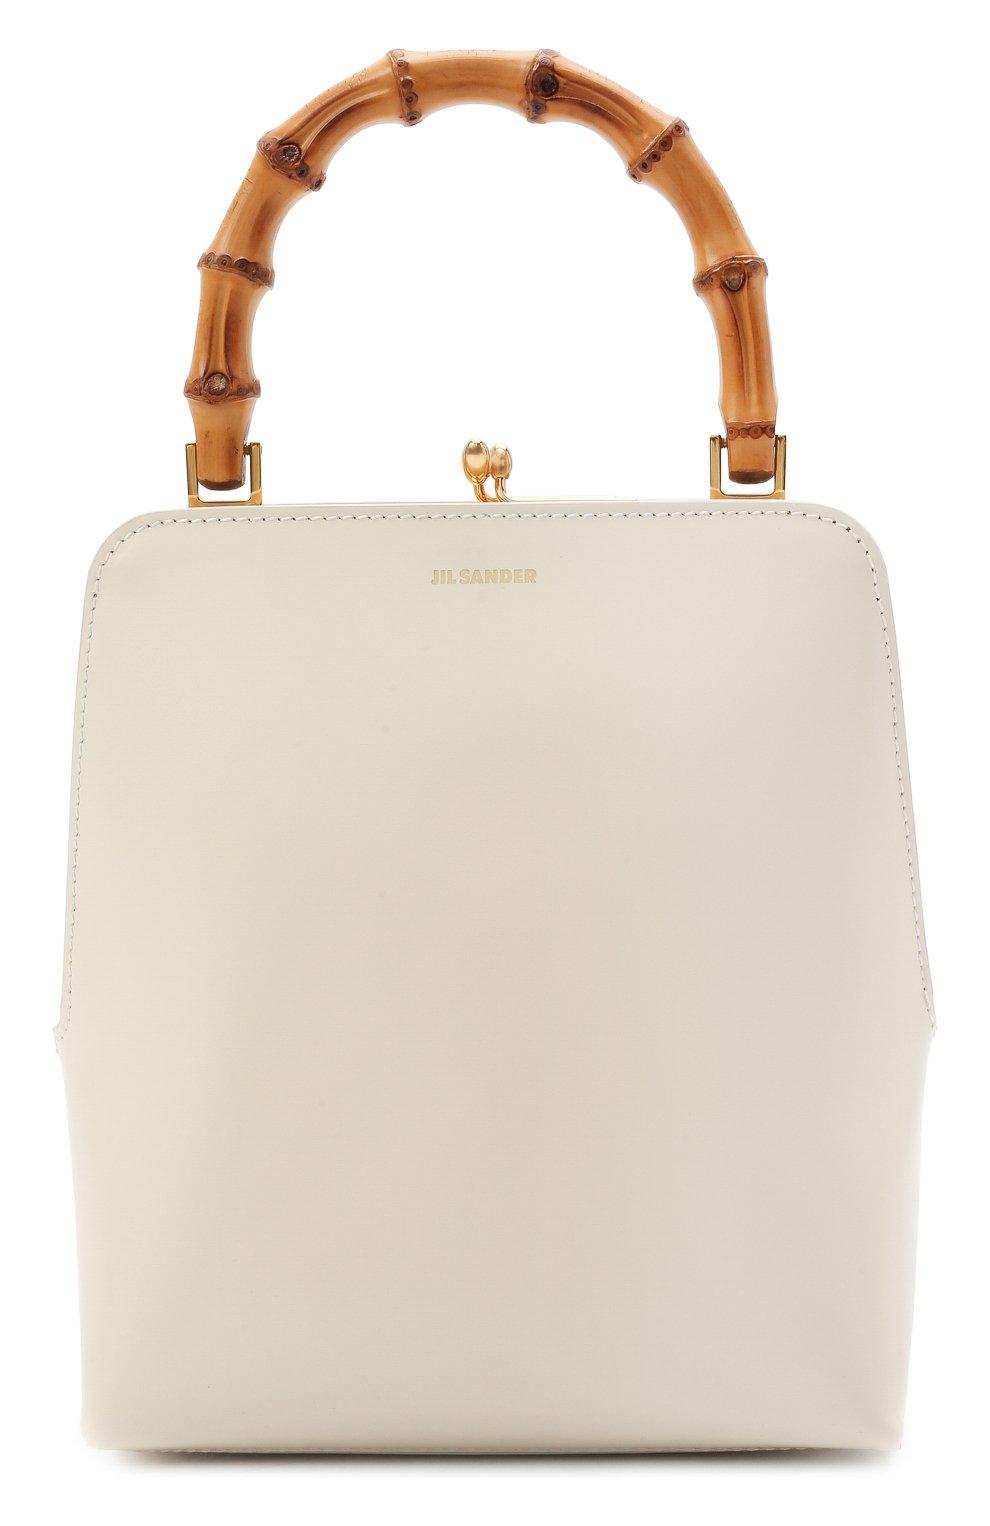 Женская сумка goji JIL SANDER кремвого цвета, арт. JSPT851578-WTB00080N | Фото 1 (Сумки-технические: Сумки top-handle; Размер: medium, mini; Материал: Натуральная кожа)